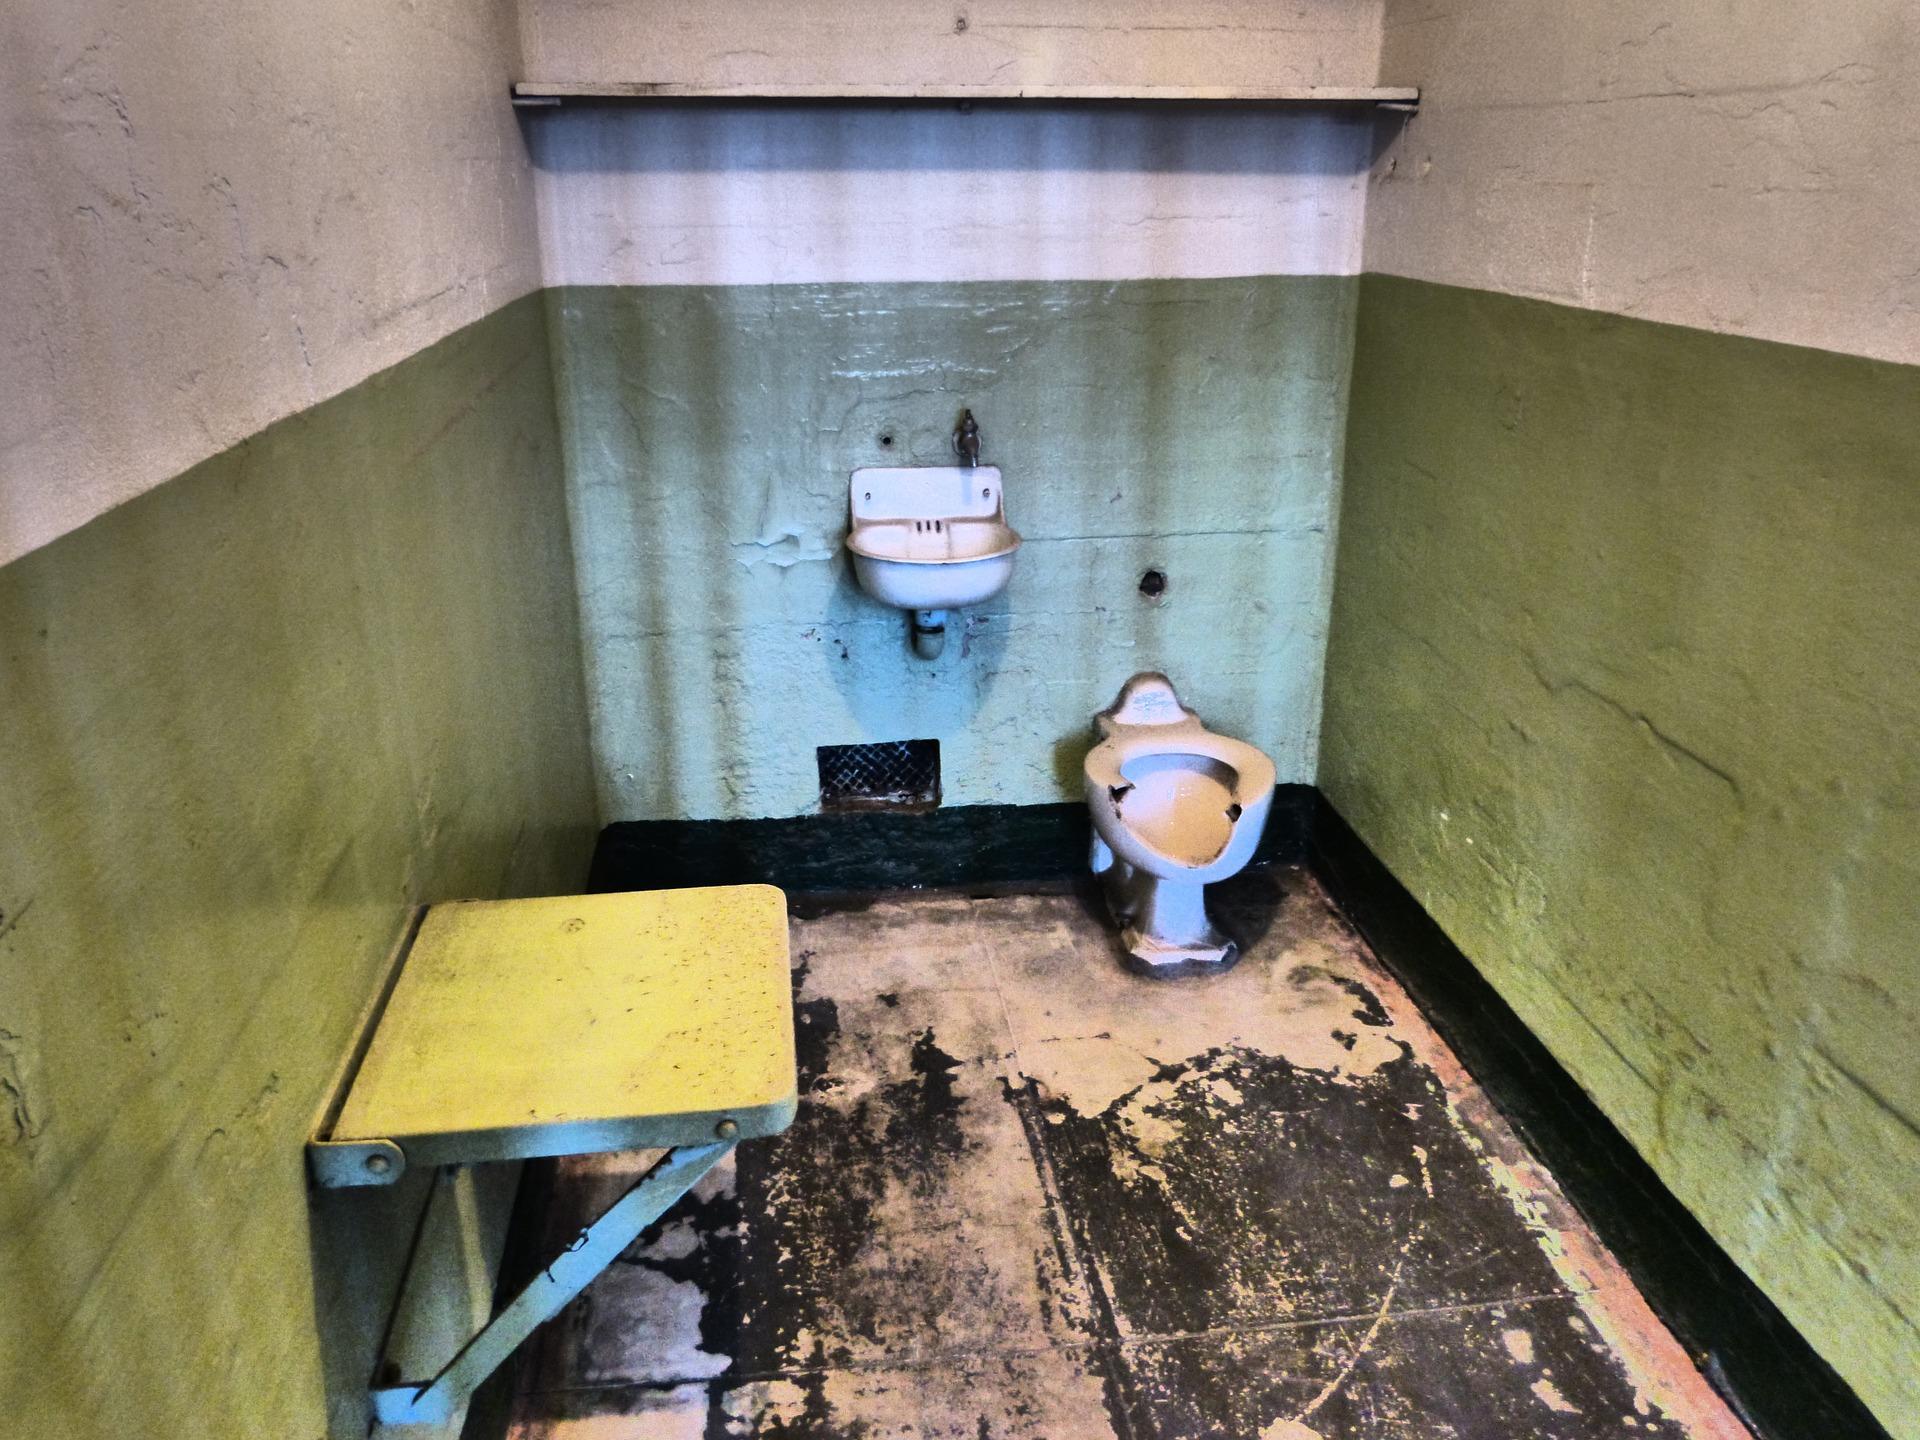 alcatraz-1010029_1920.jpg